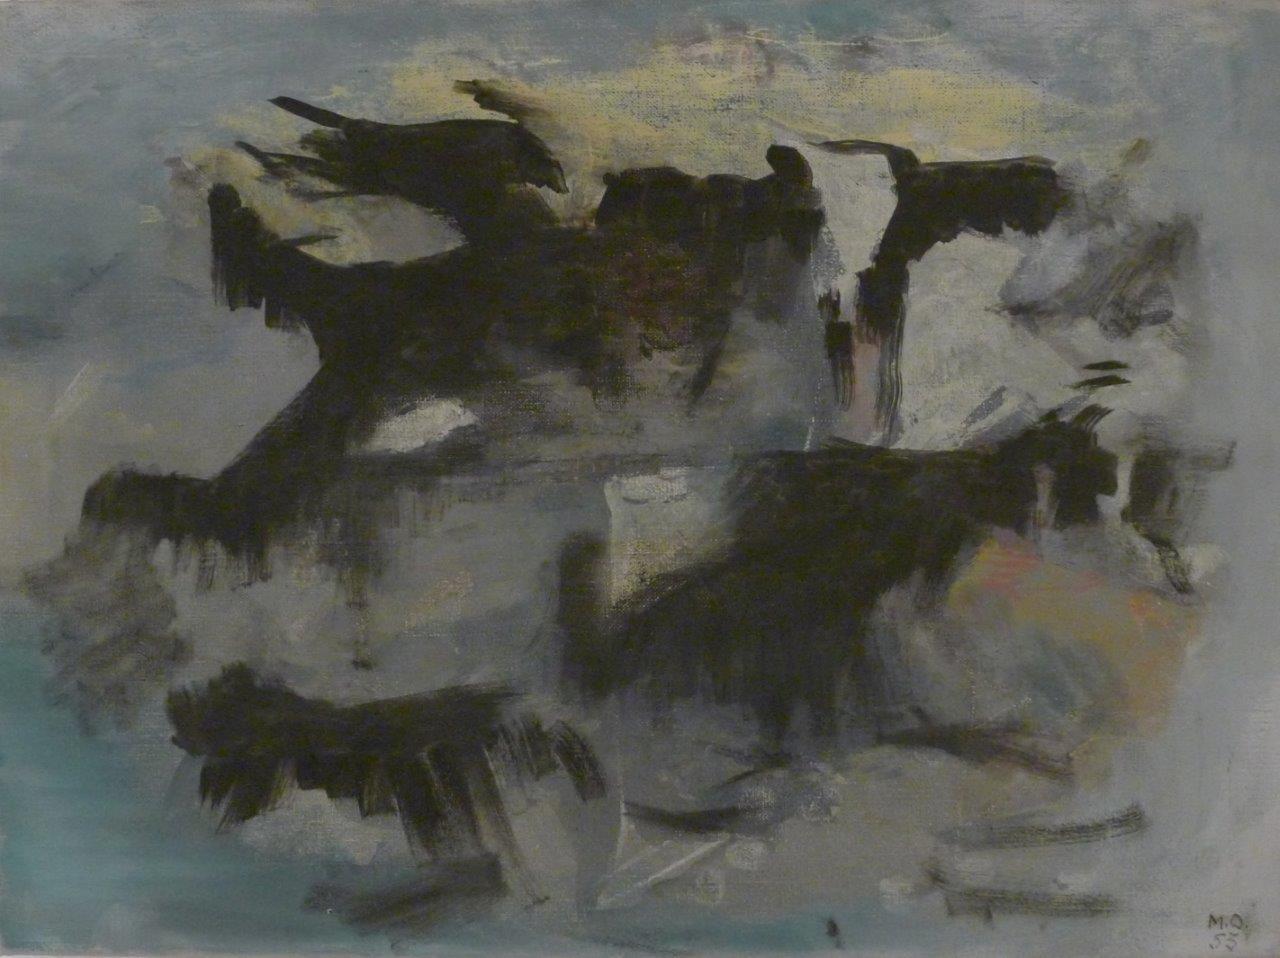 Meret Oppenheim, Nuages, 1953, Kunsthaus Zug